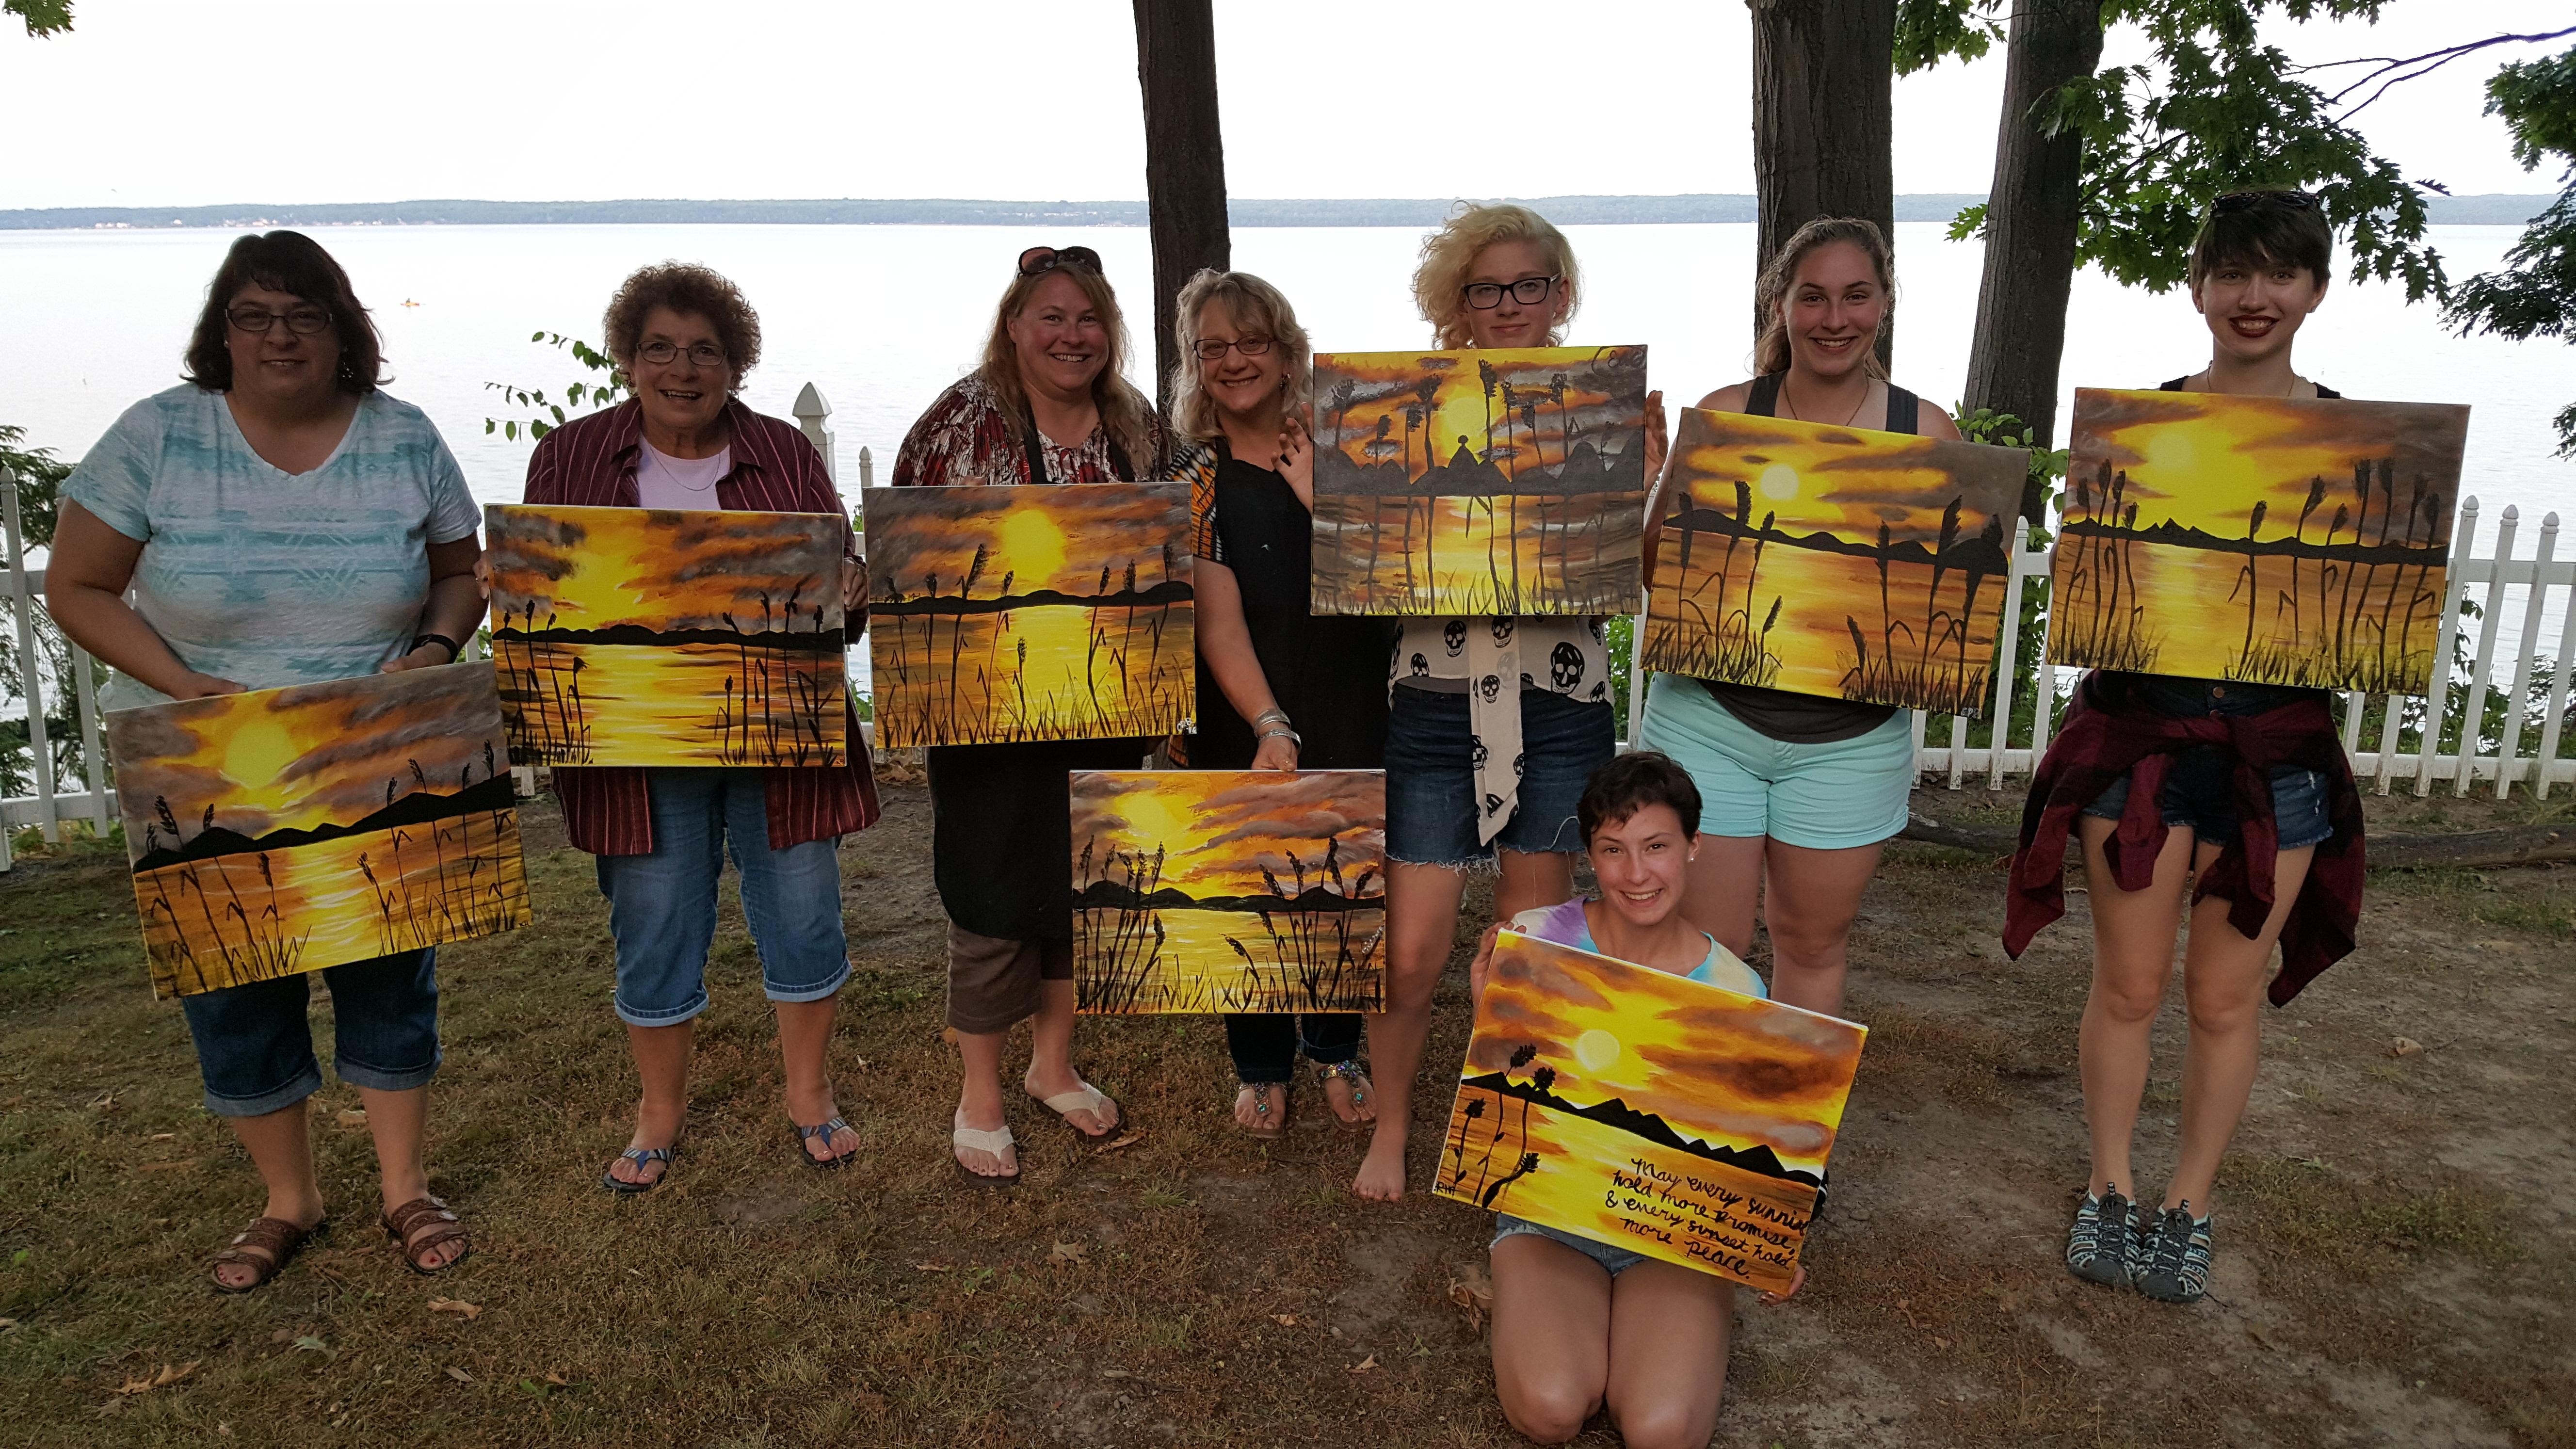 Private Party on Seneca Lake